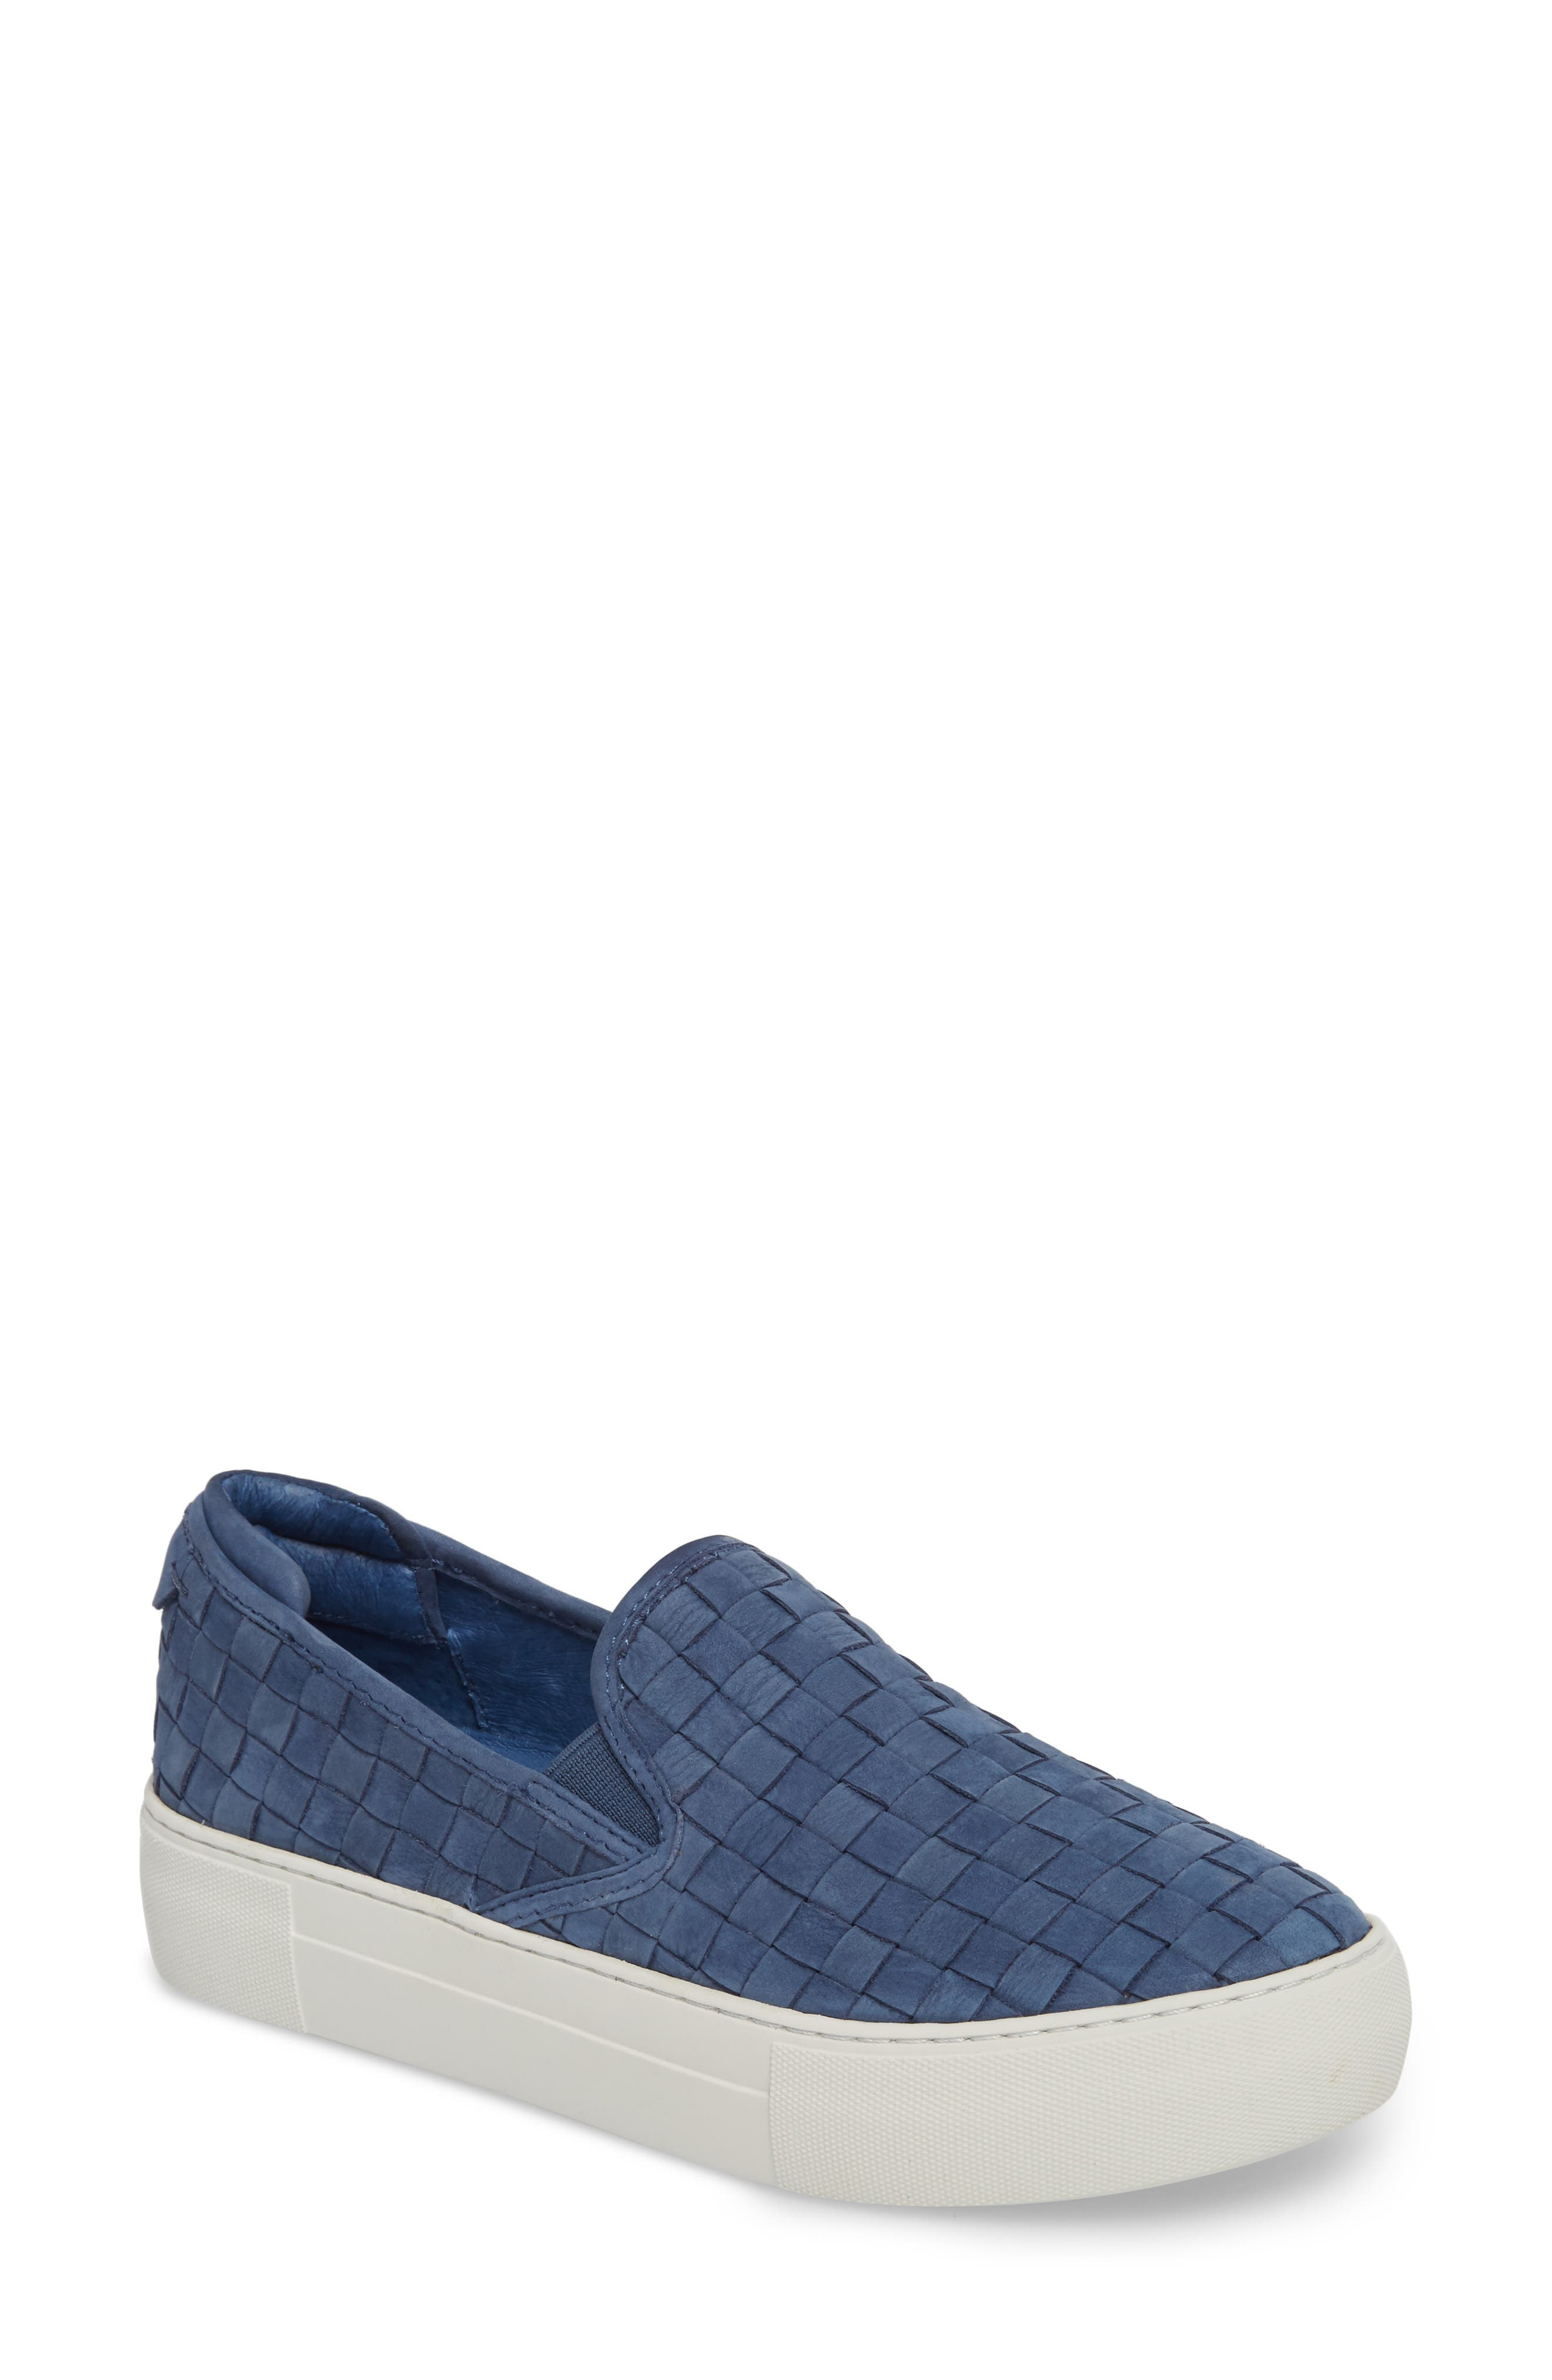 JSlides Proper Slip-On Sneaker (Women)